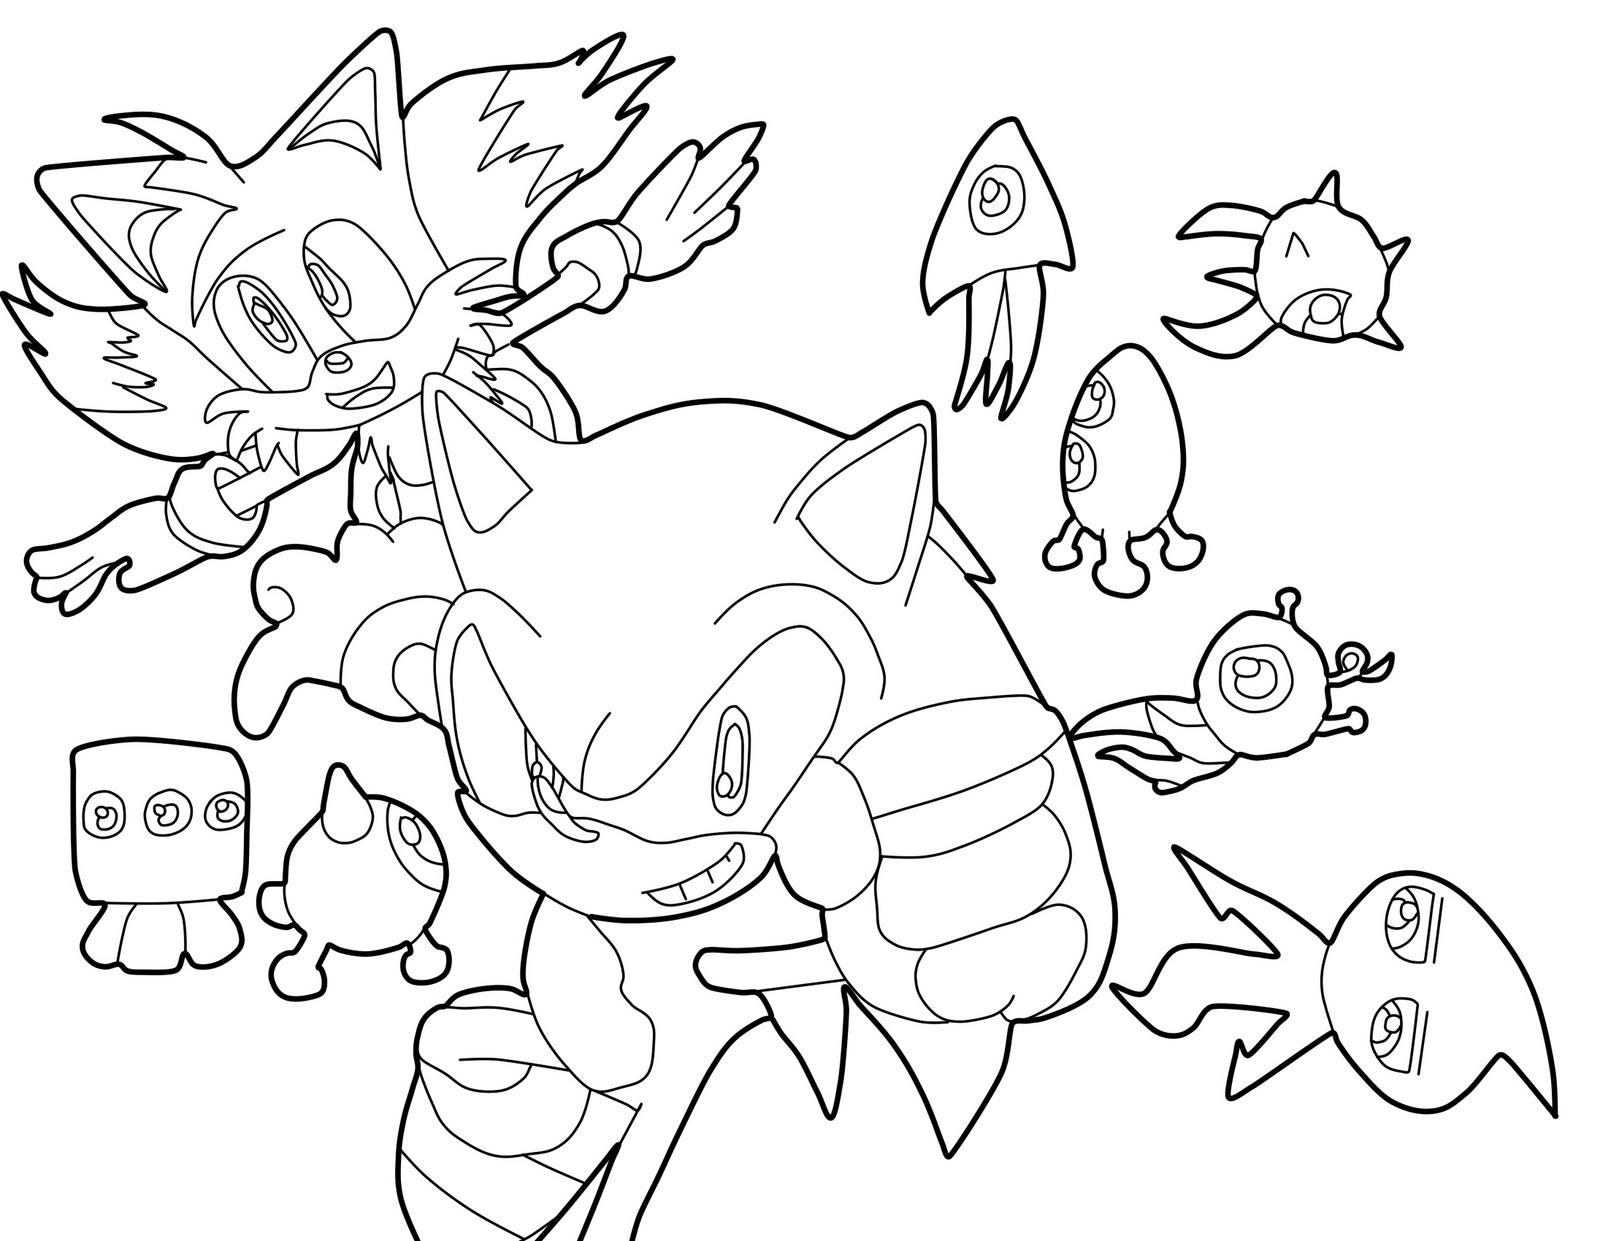 Dibujos Sonic Para Imprimir: Blog MegaDiverso: Sonic Para Imprimir Y Pintar